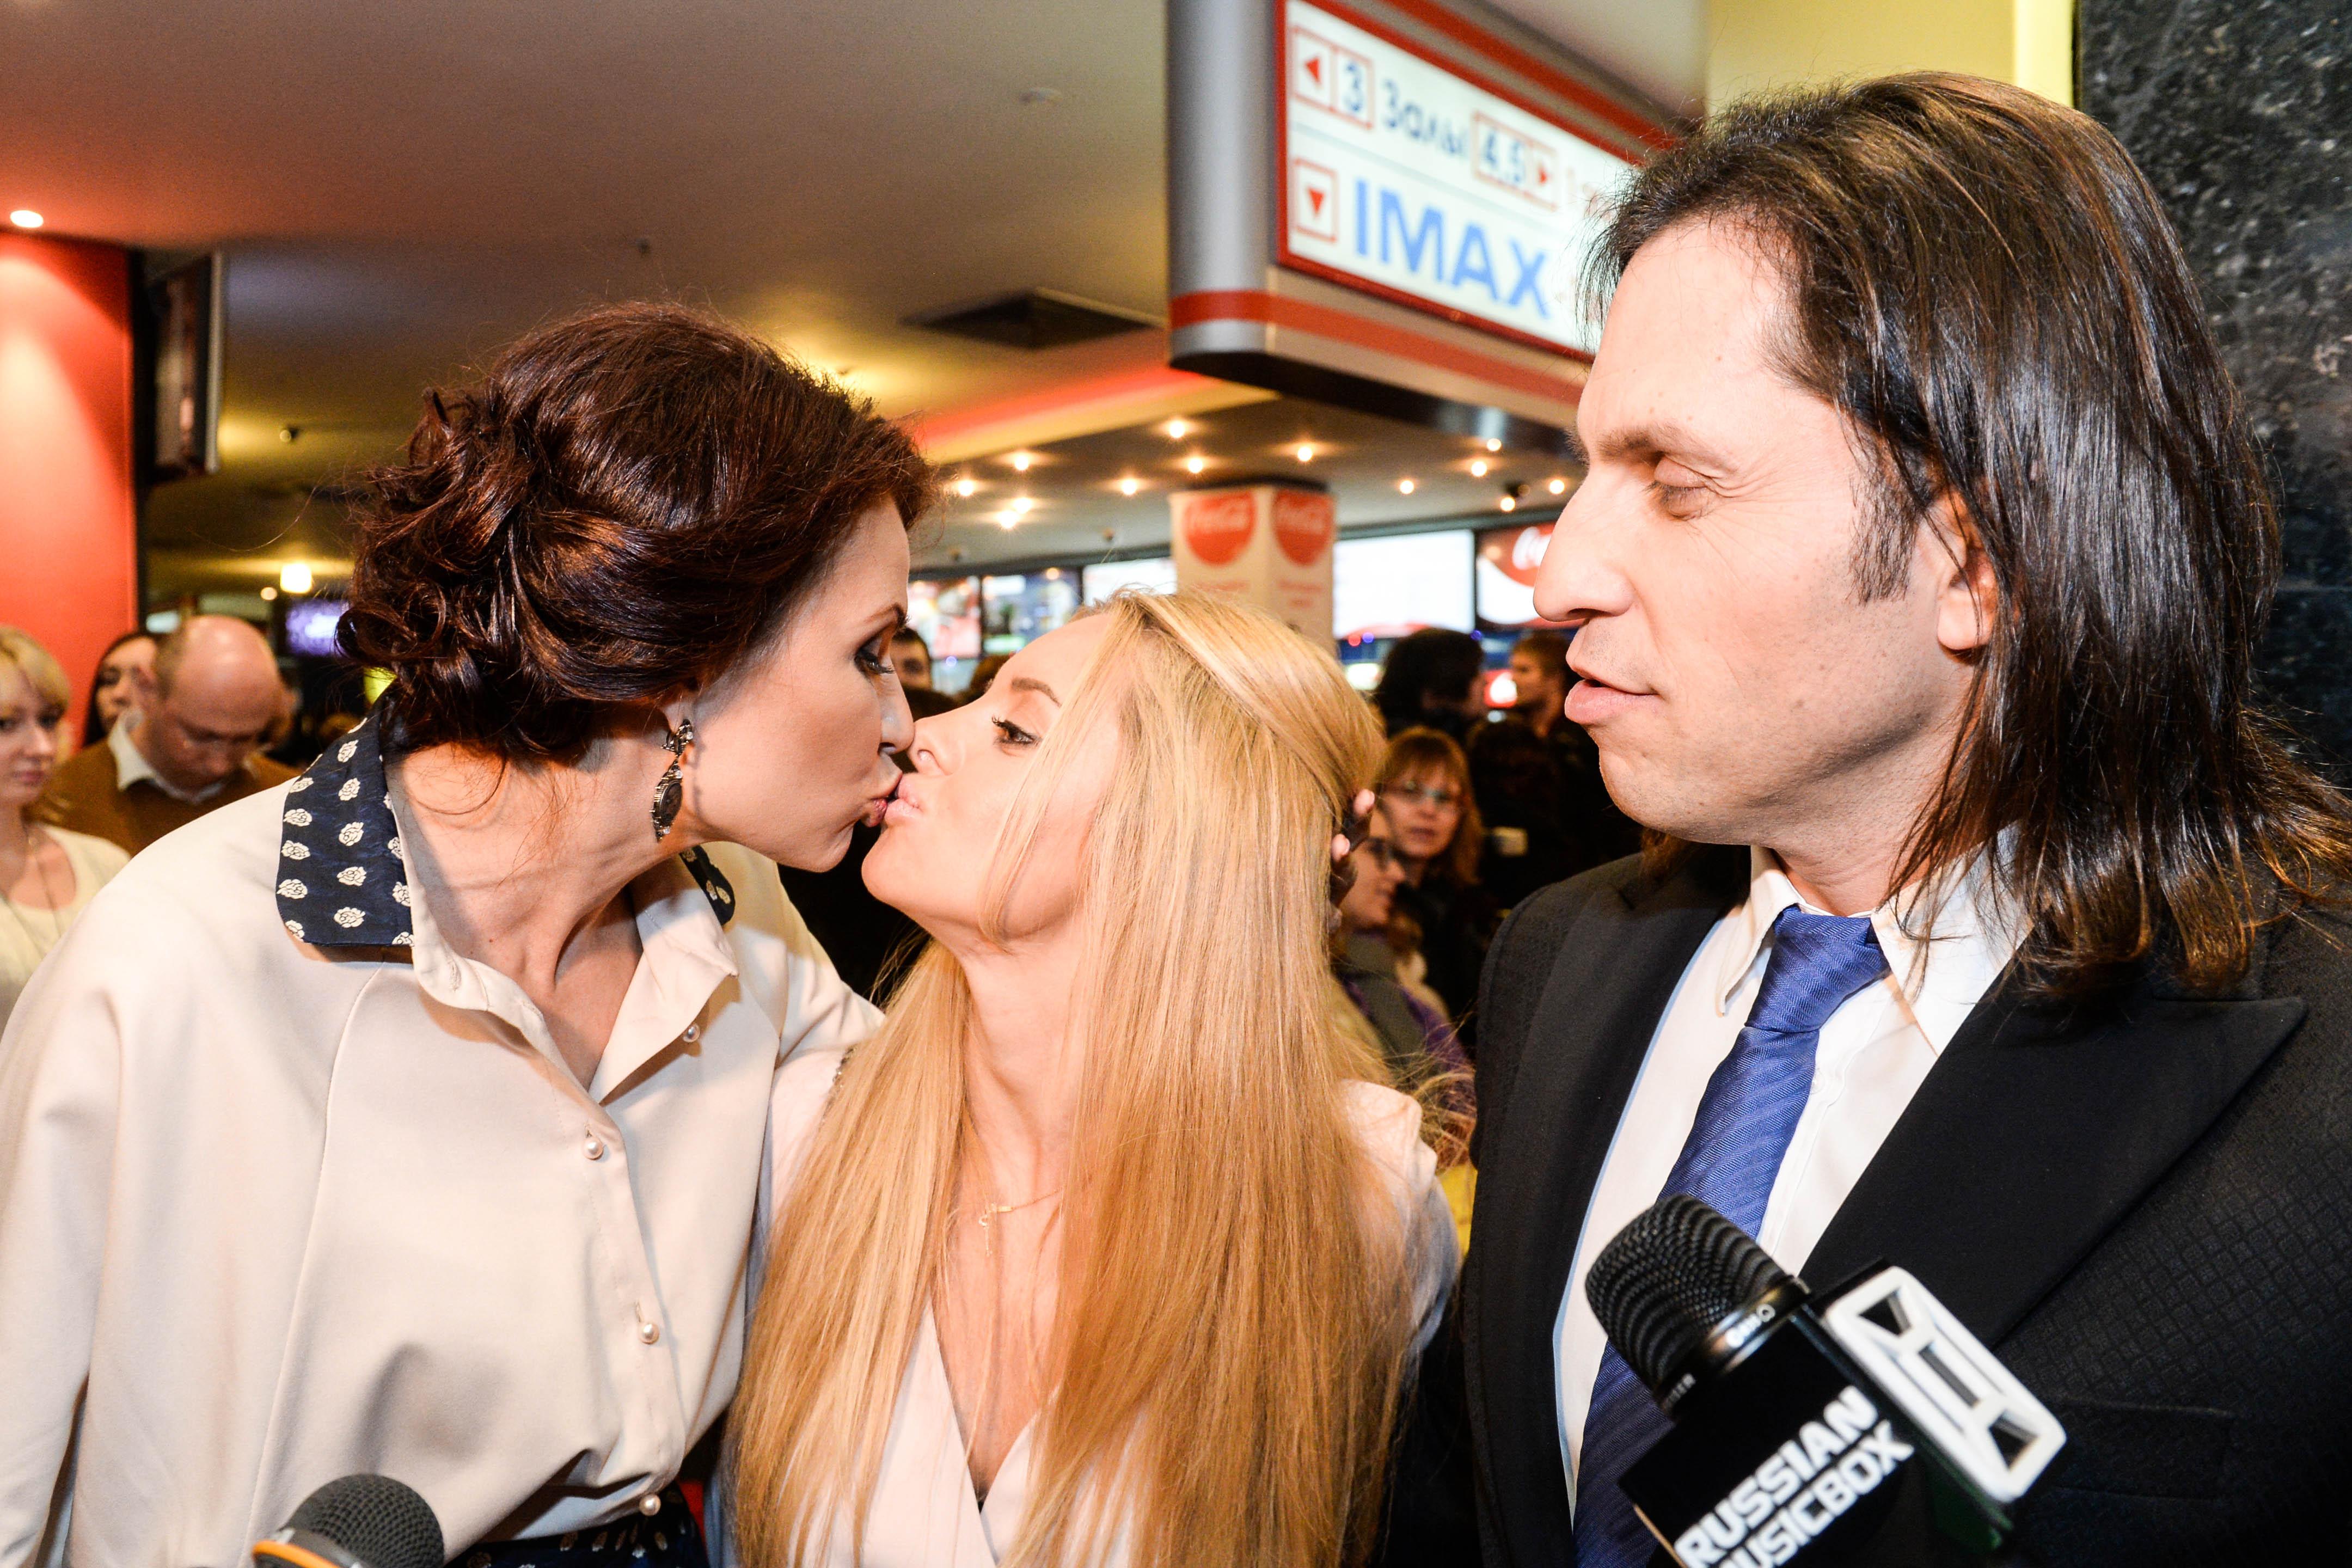 Эвелина Бледанс и Александр Ревва с супругой